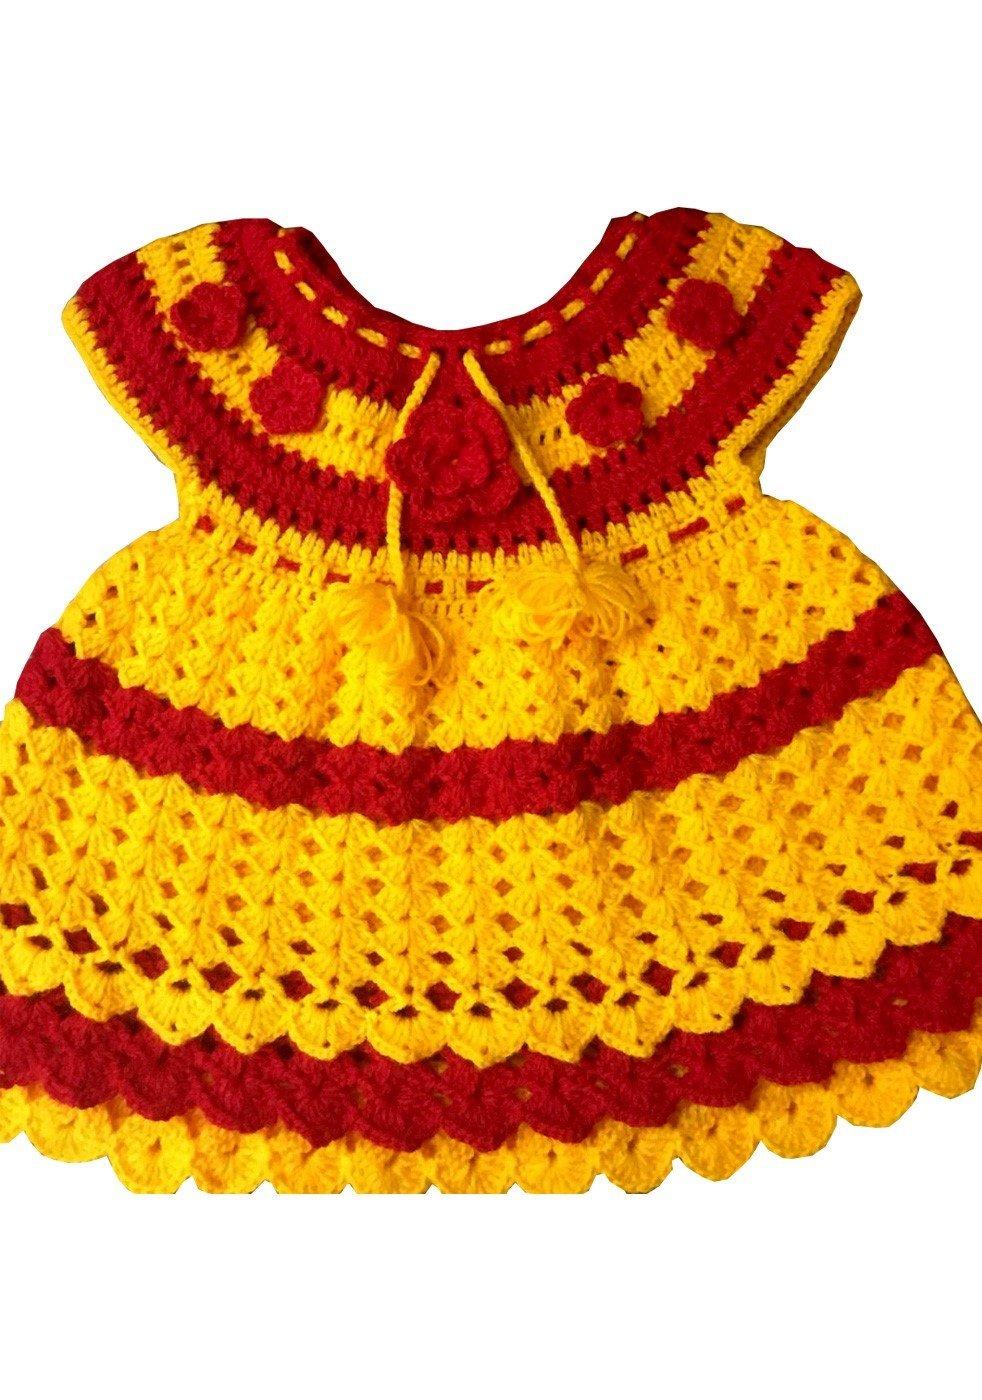 Hand Crocheted Yellow Red Baby Dress